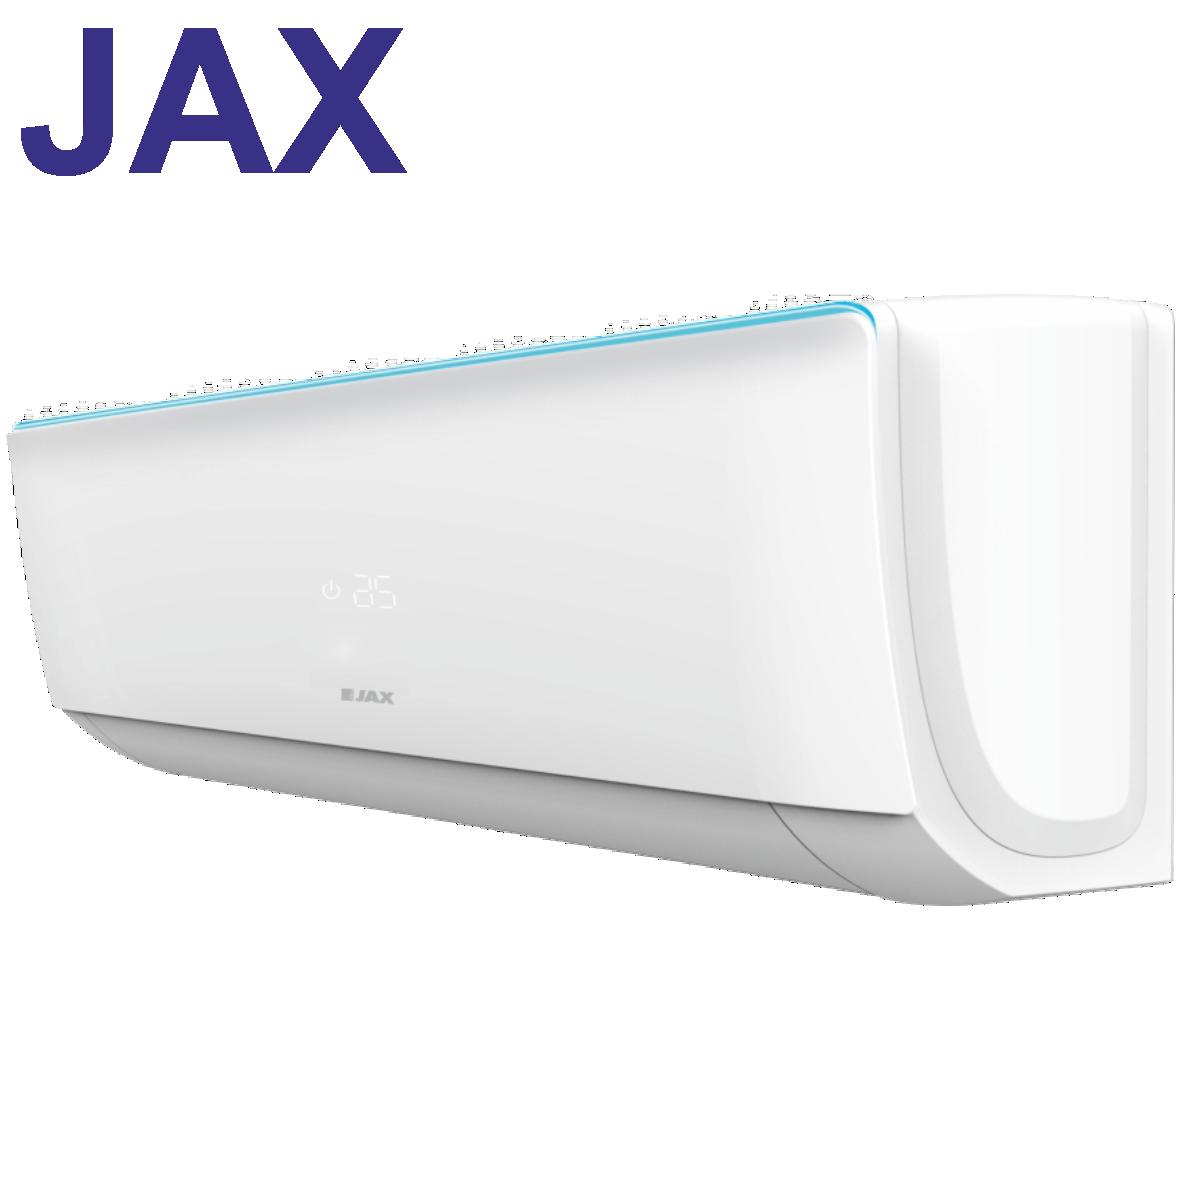 JAX Melbourne